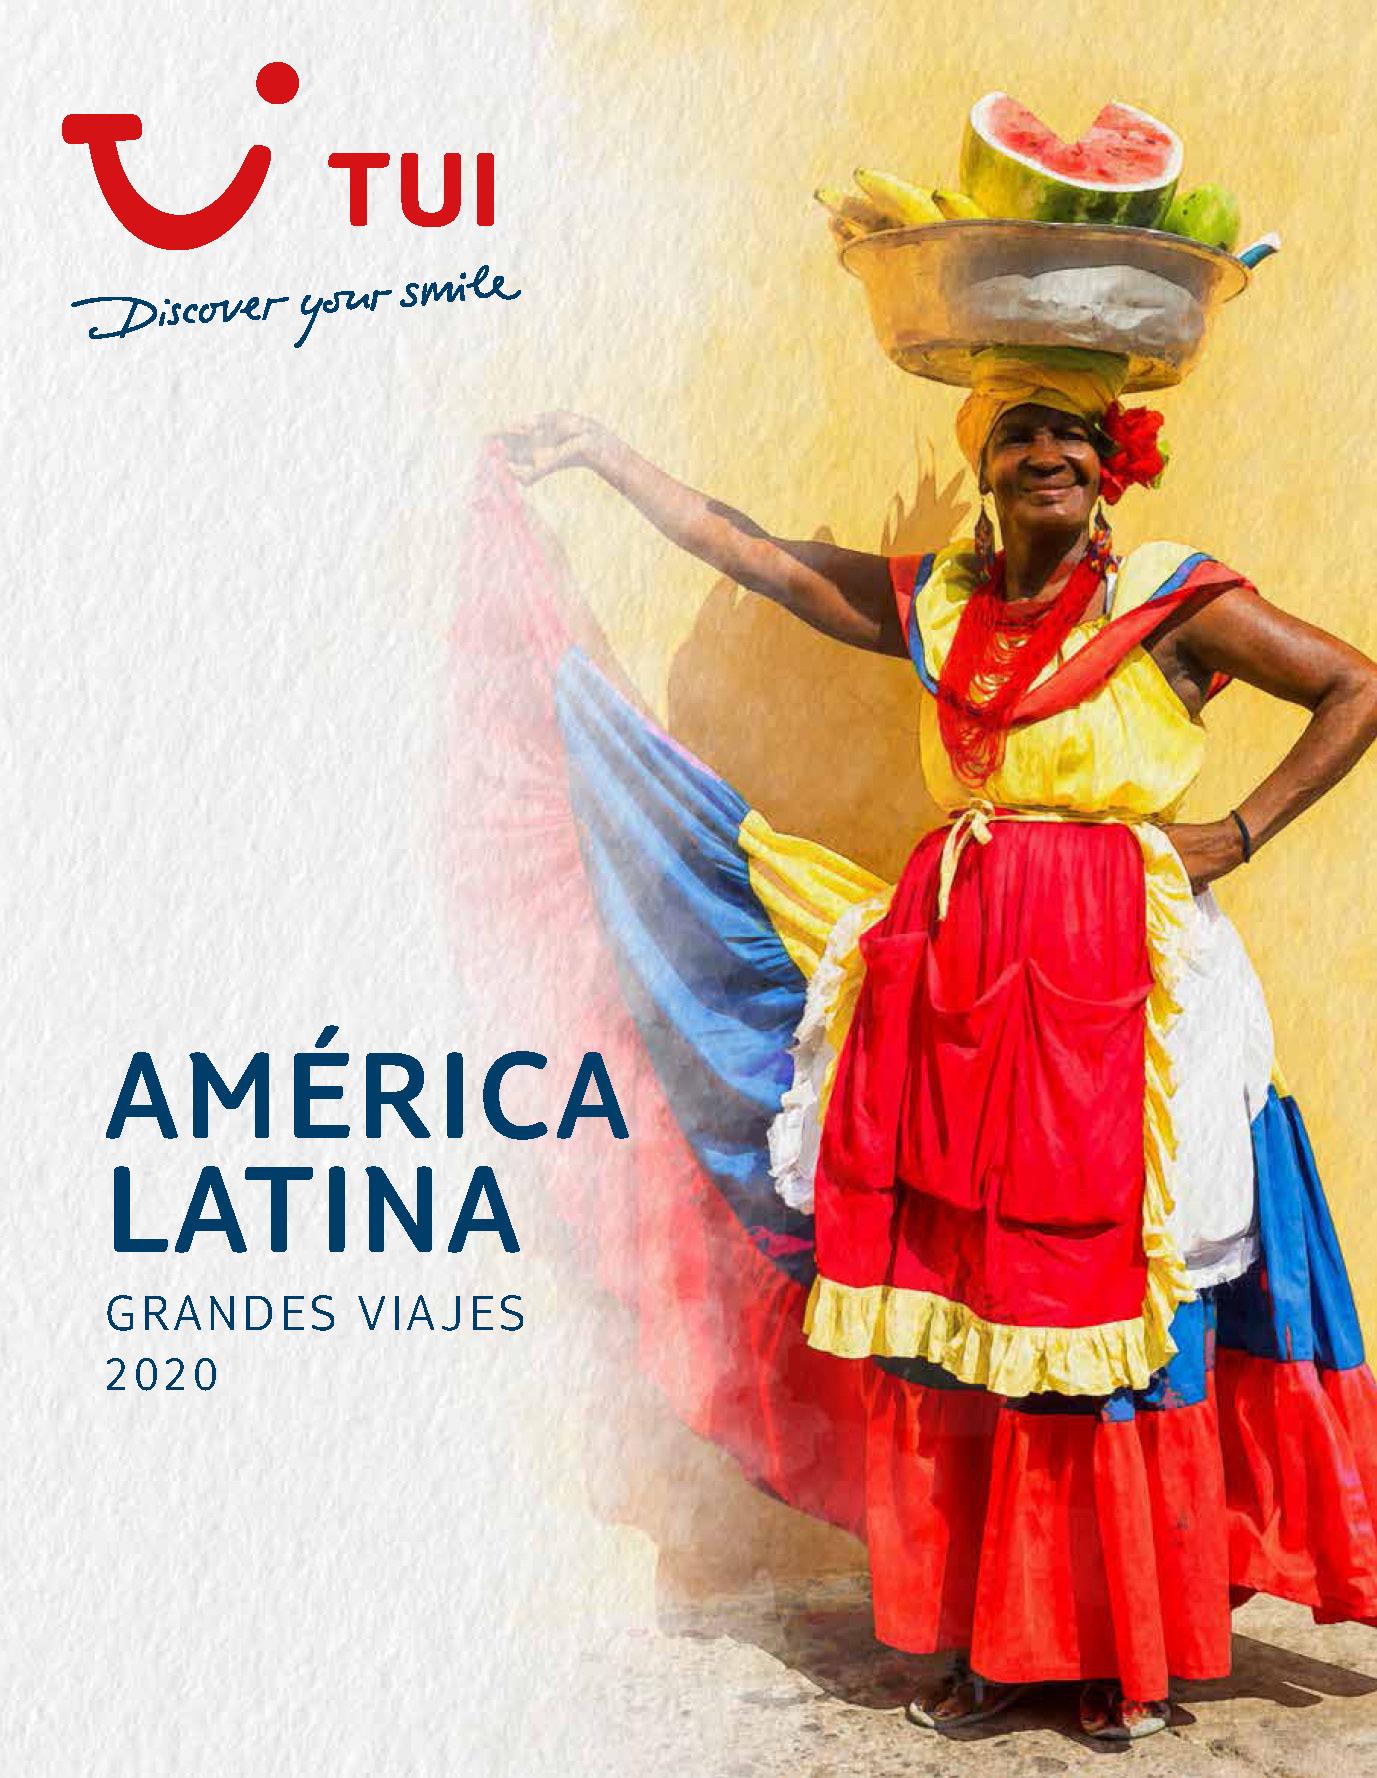 Catalogo TUI America Latina 2020